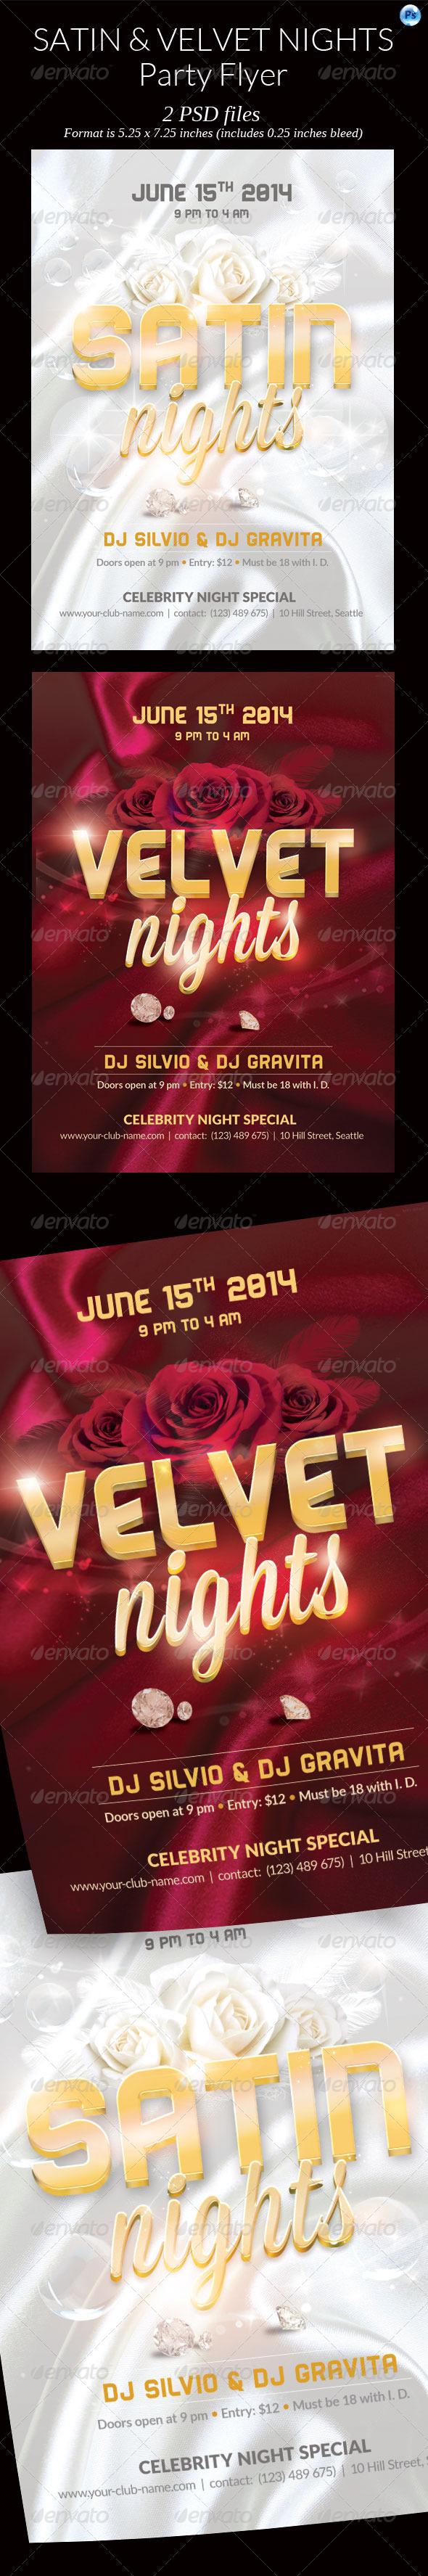 GraphicRiver 2 Satin Velvet Night Party Flyer 7613736